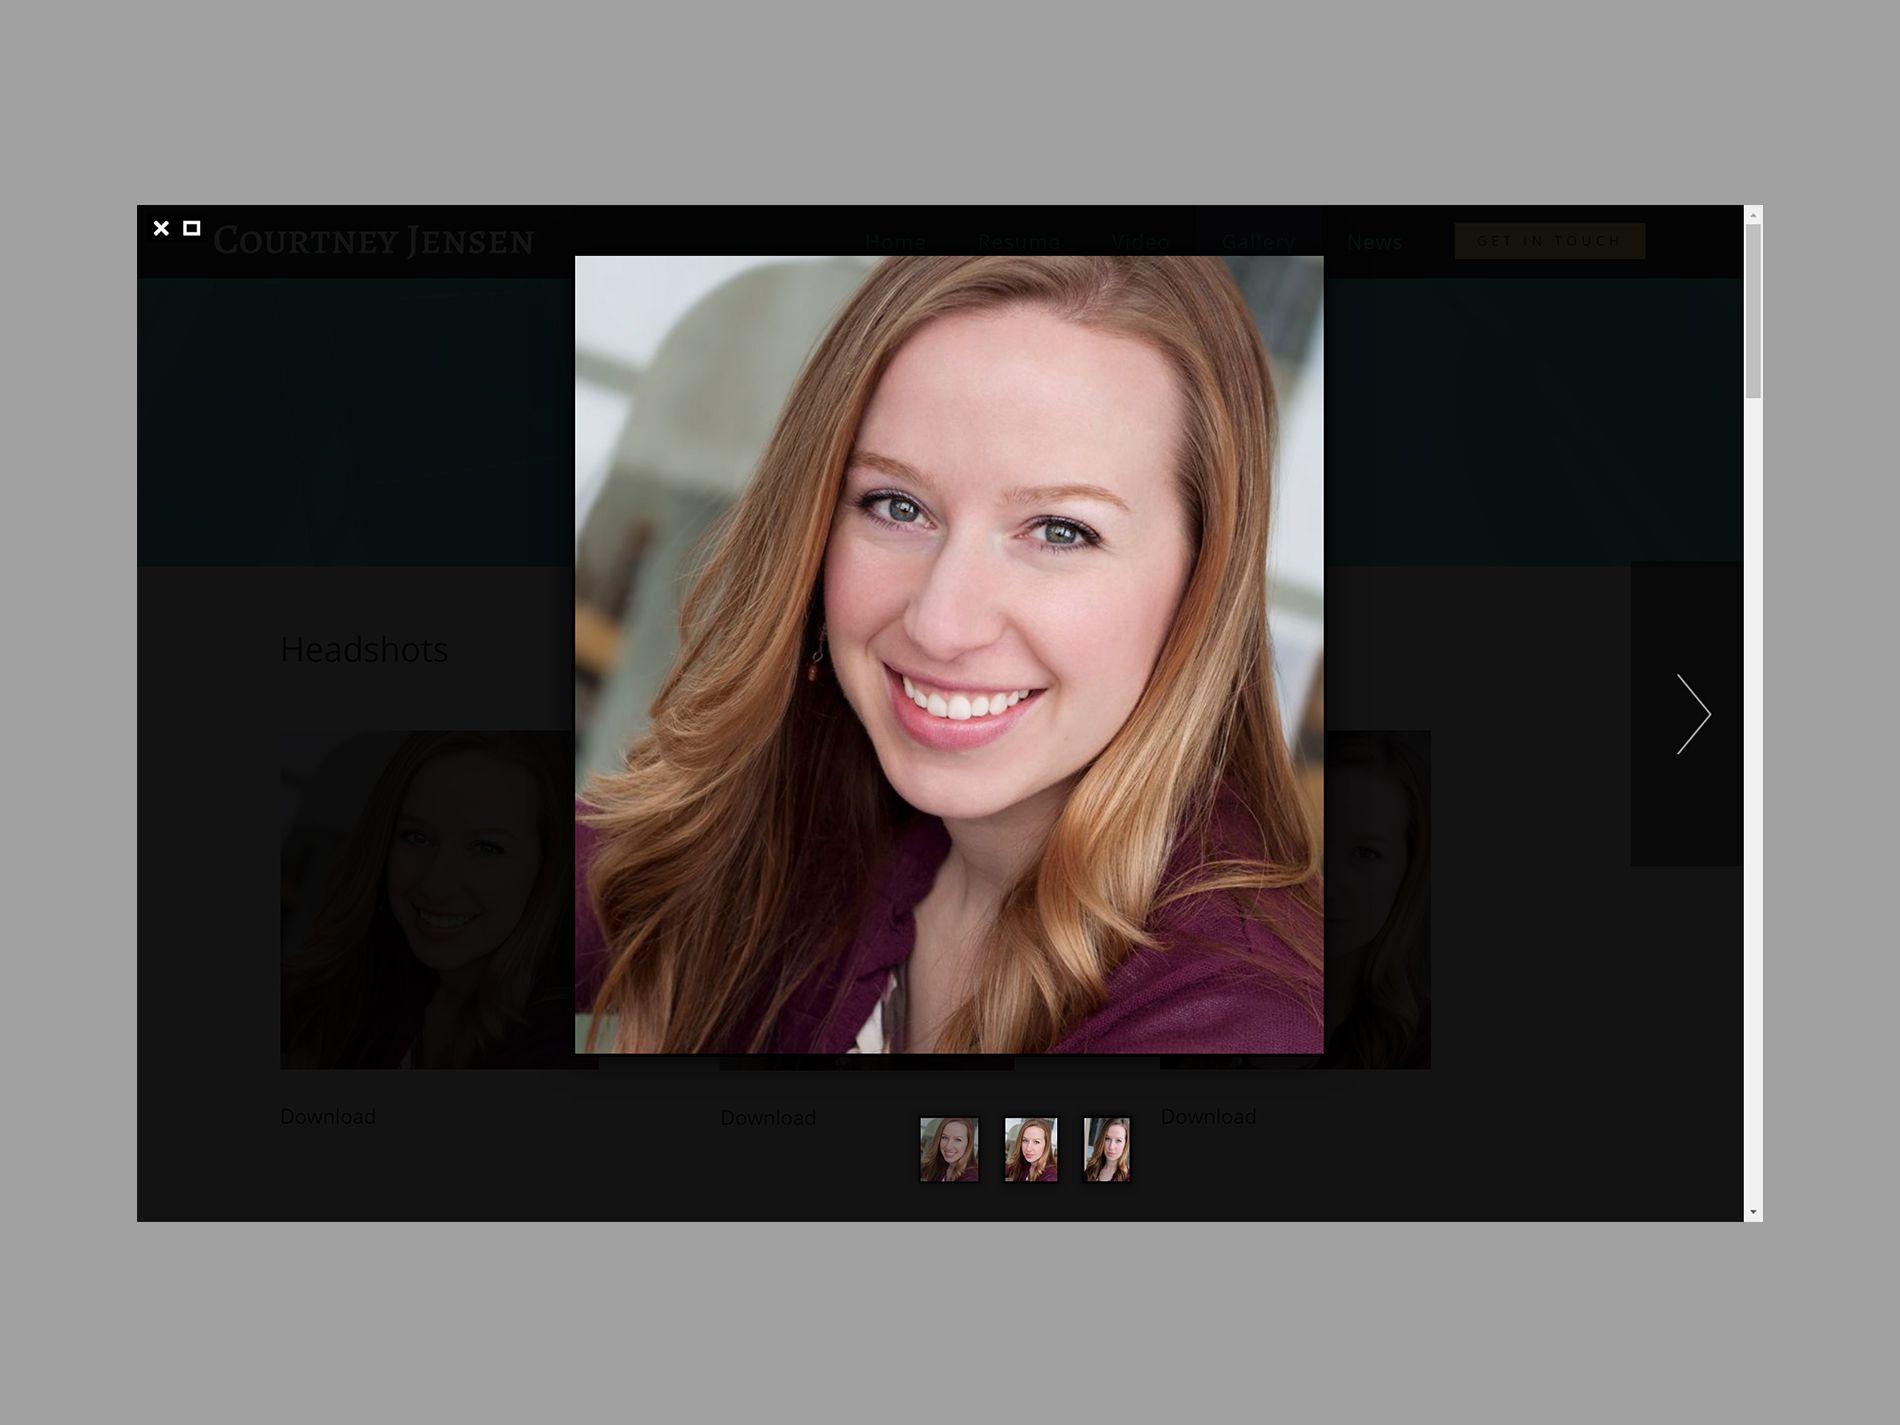 Courtney Jensen Website Lightbox